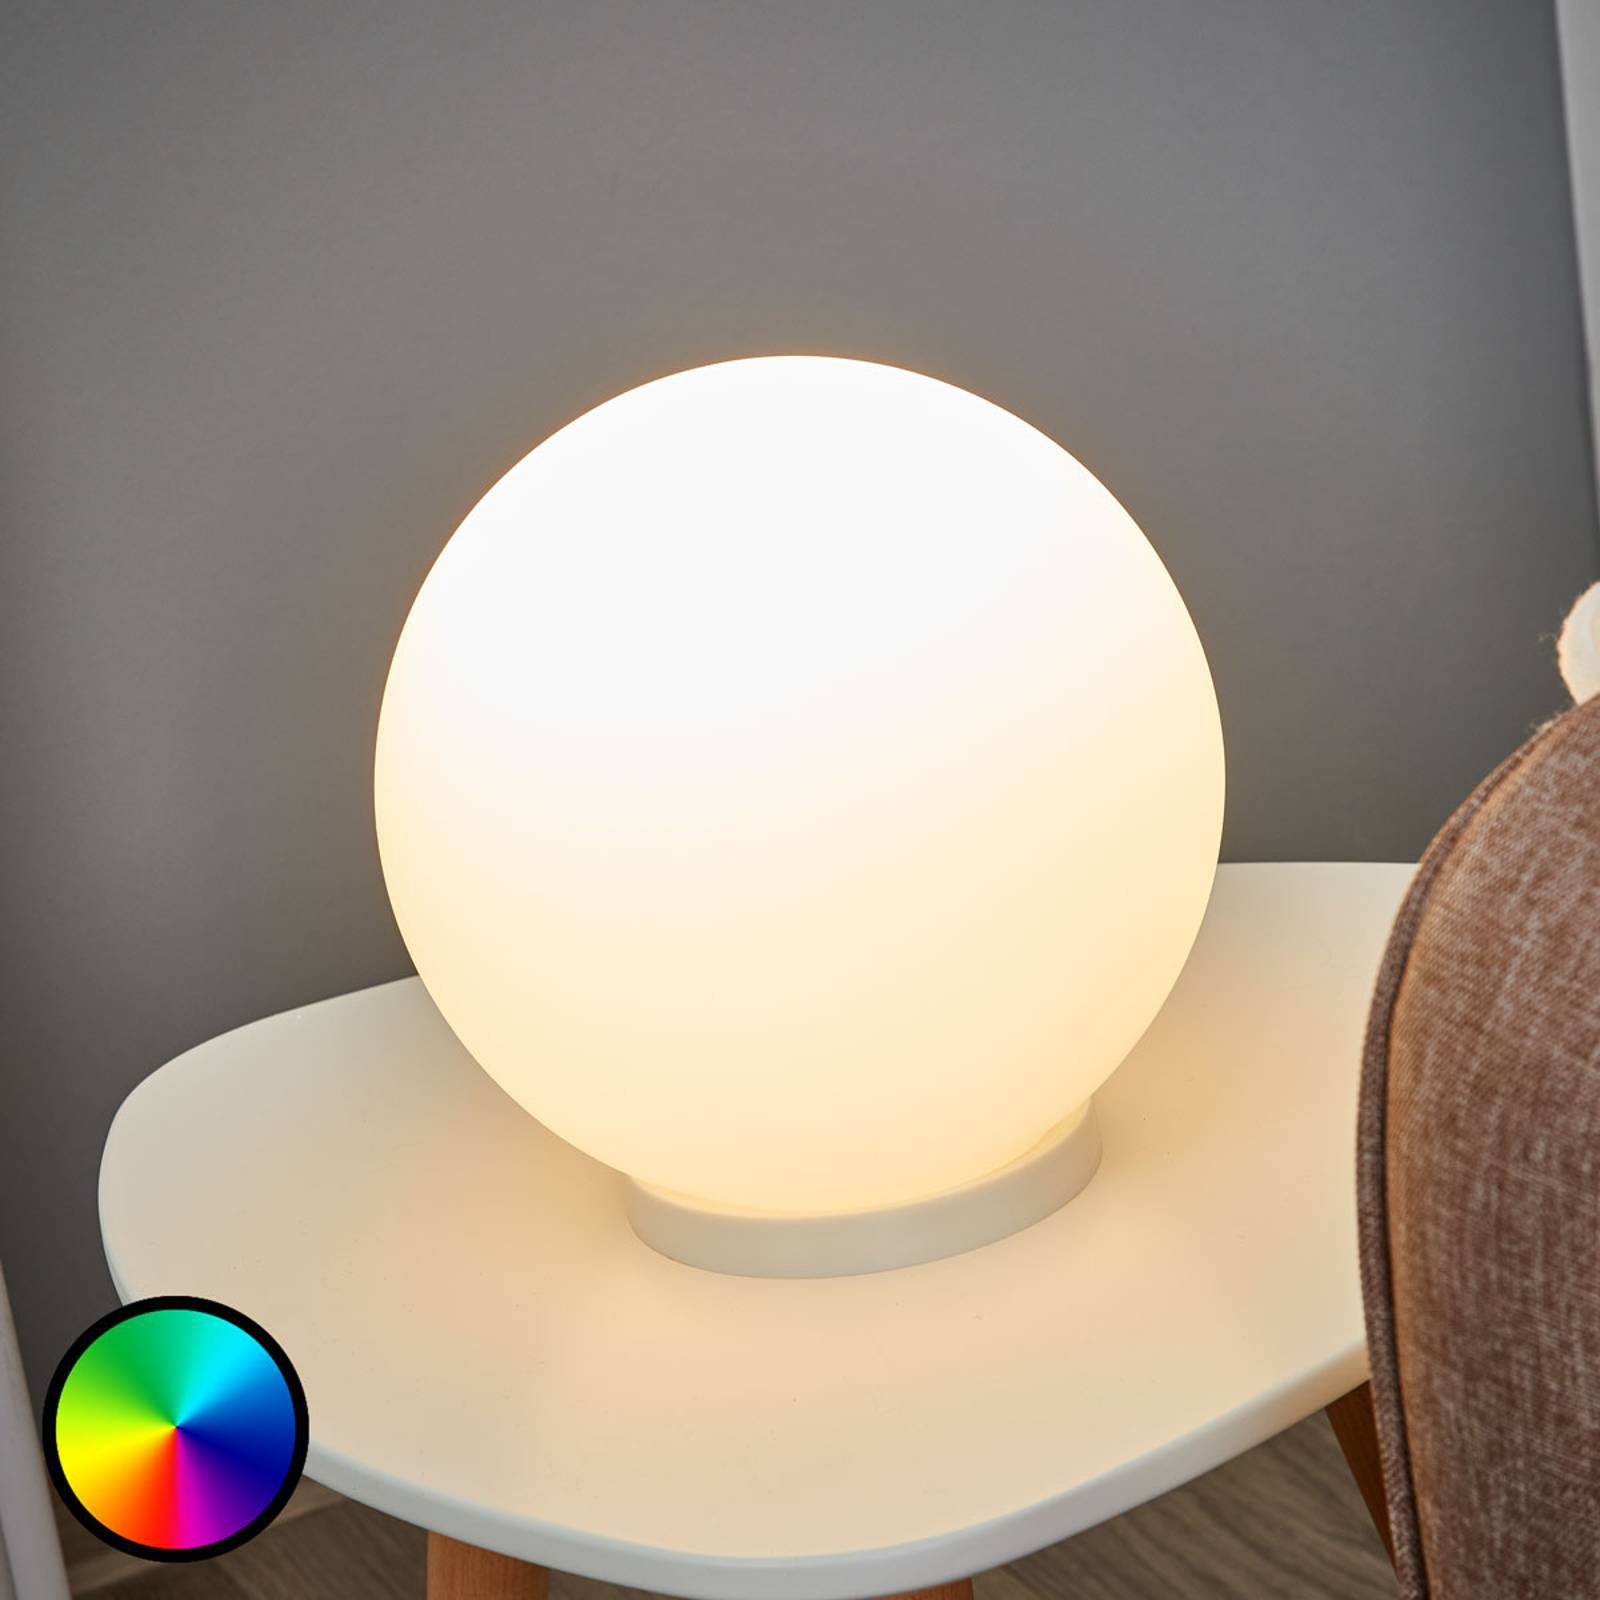 Avstandstaklampe Rondo-C LED RGBW